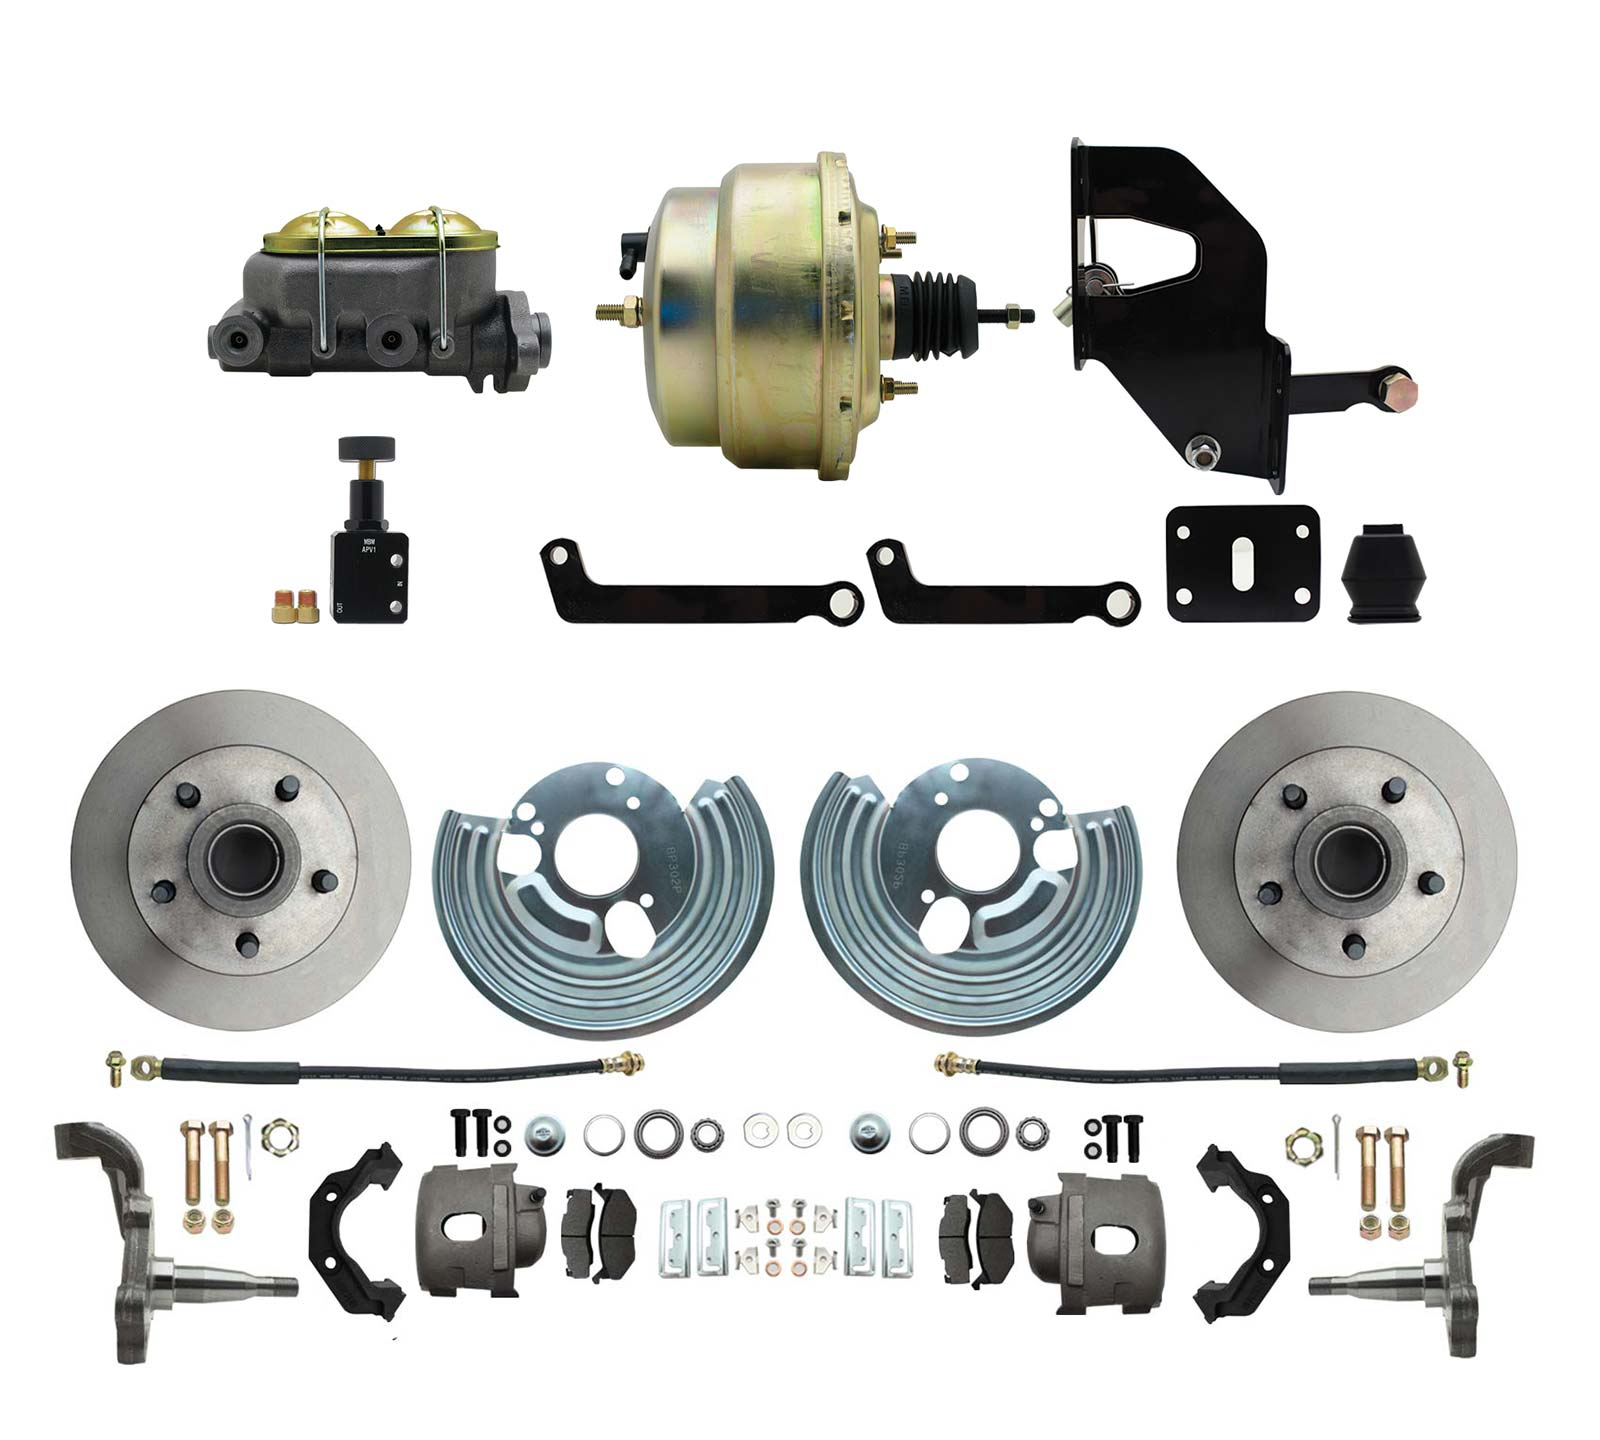 Dual Wheel Conversion Kits Dodge